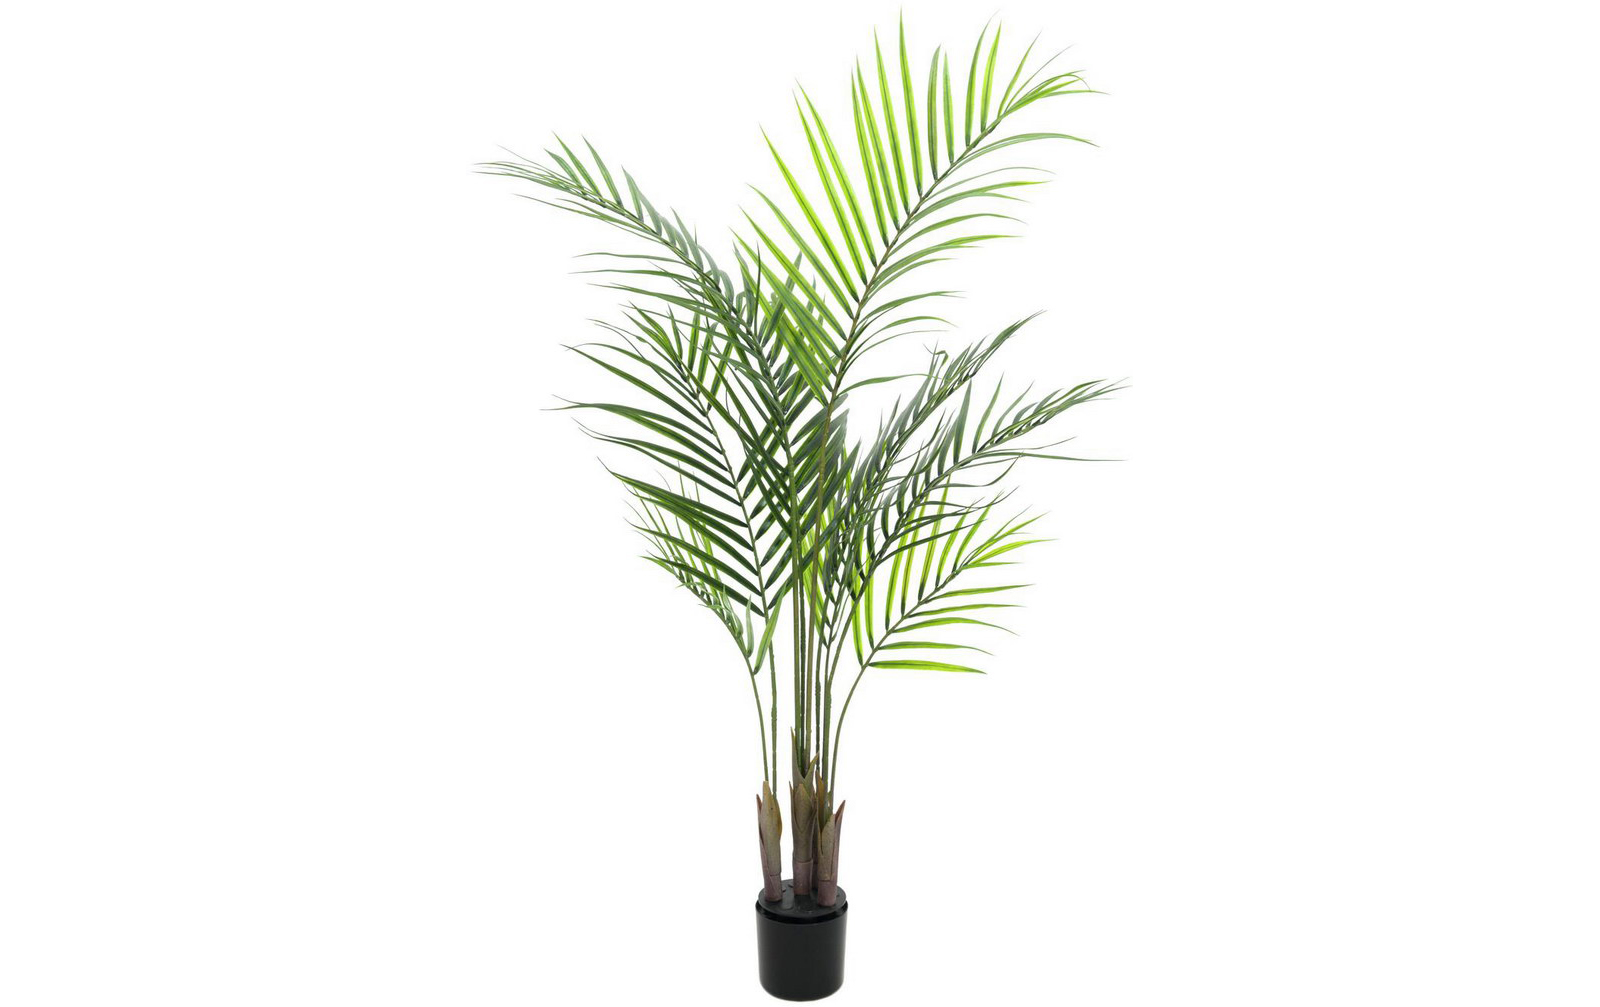 europalms-groayblatt-areca-125cm-kunststoffpflanze